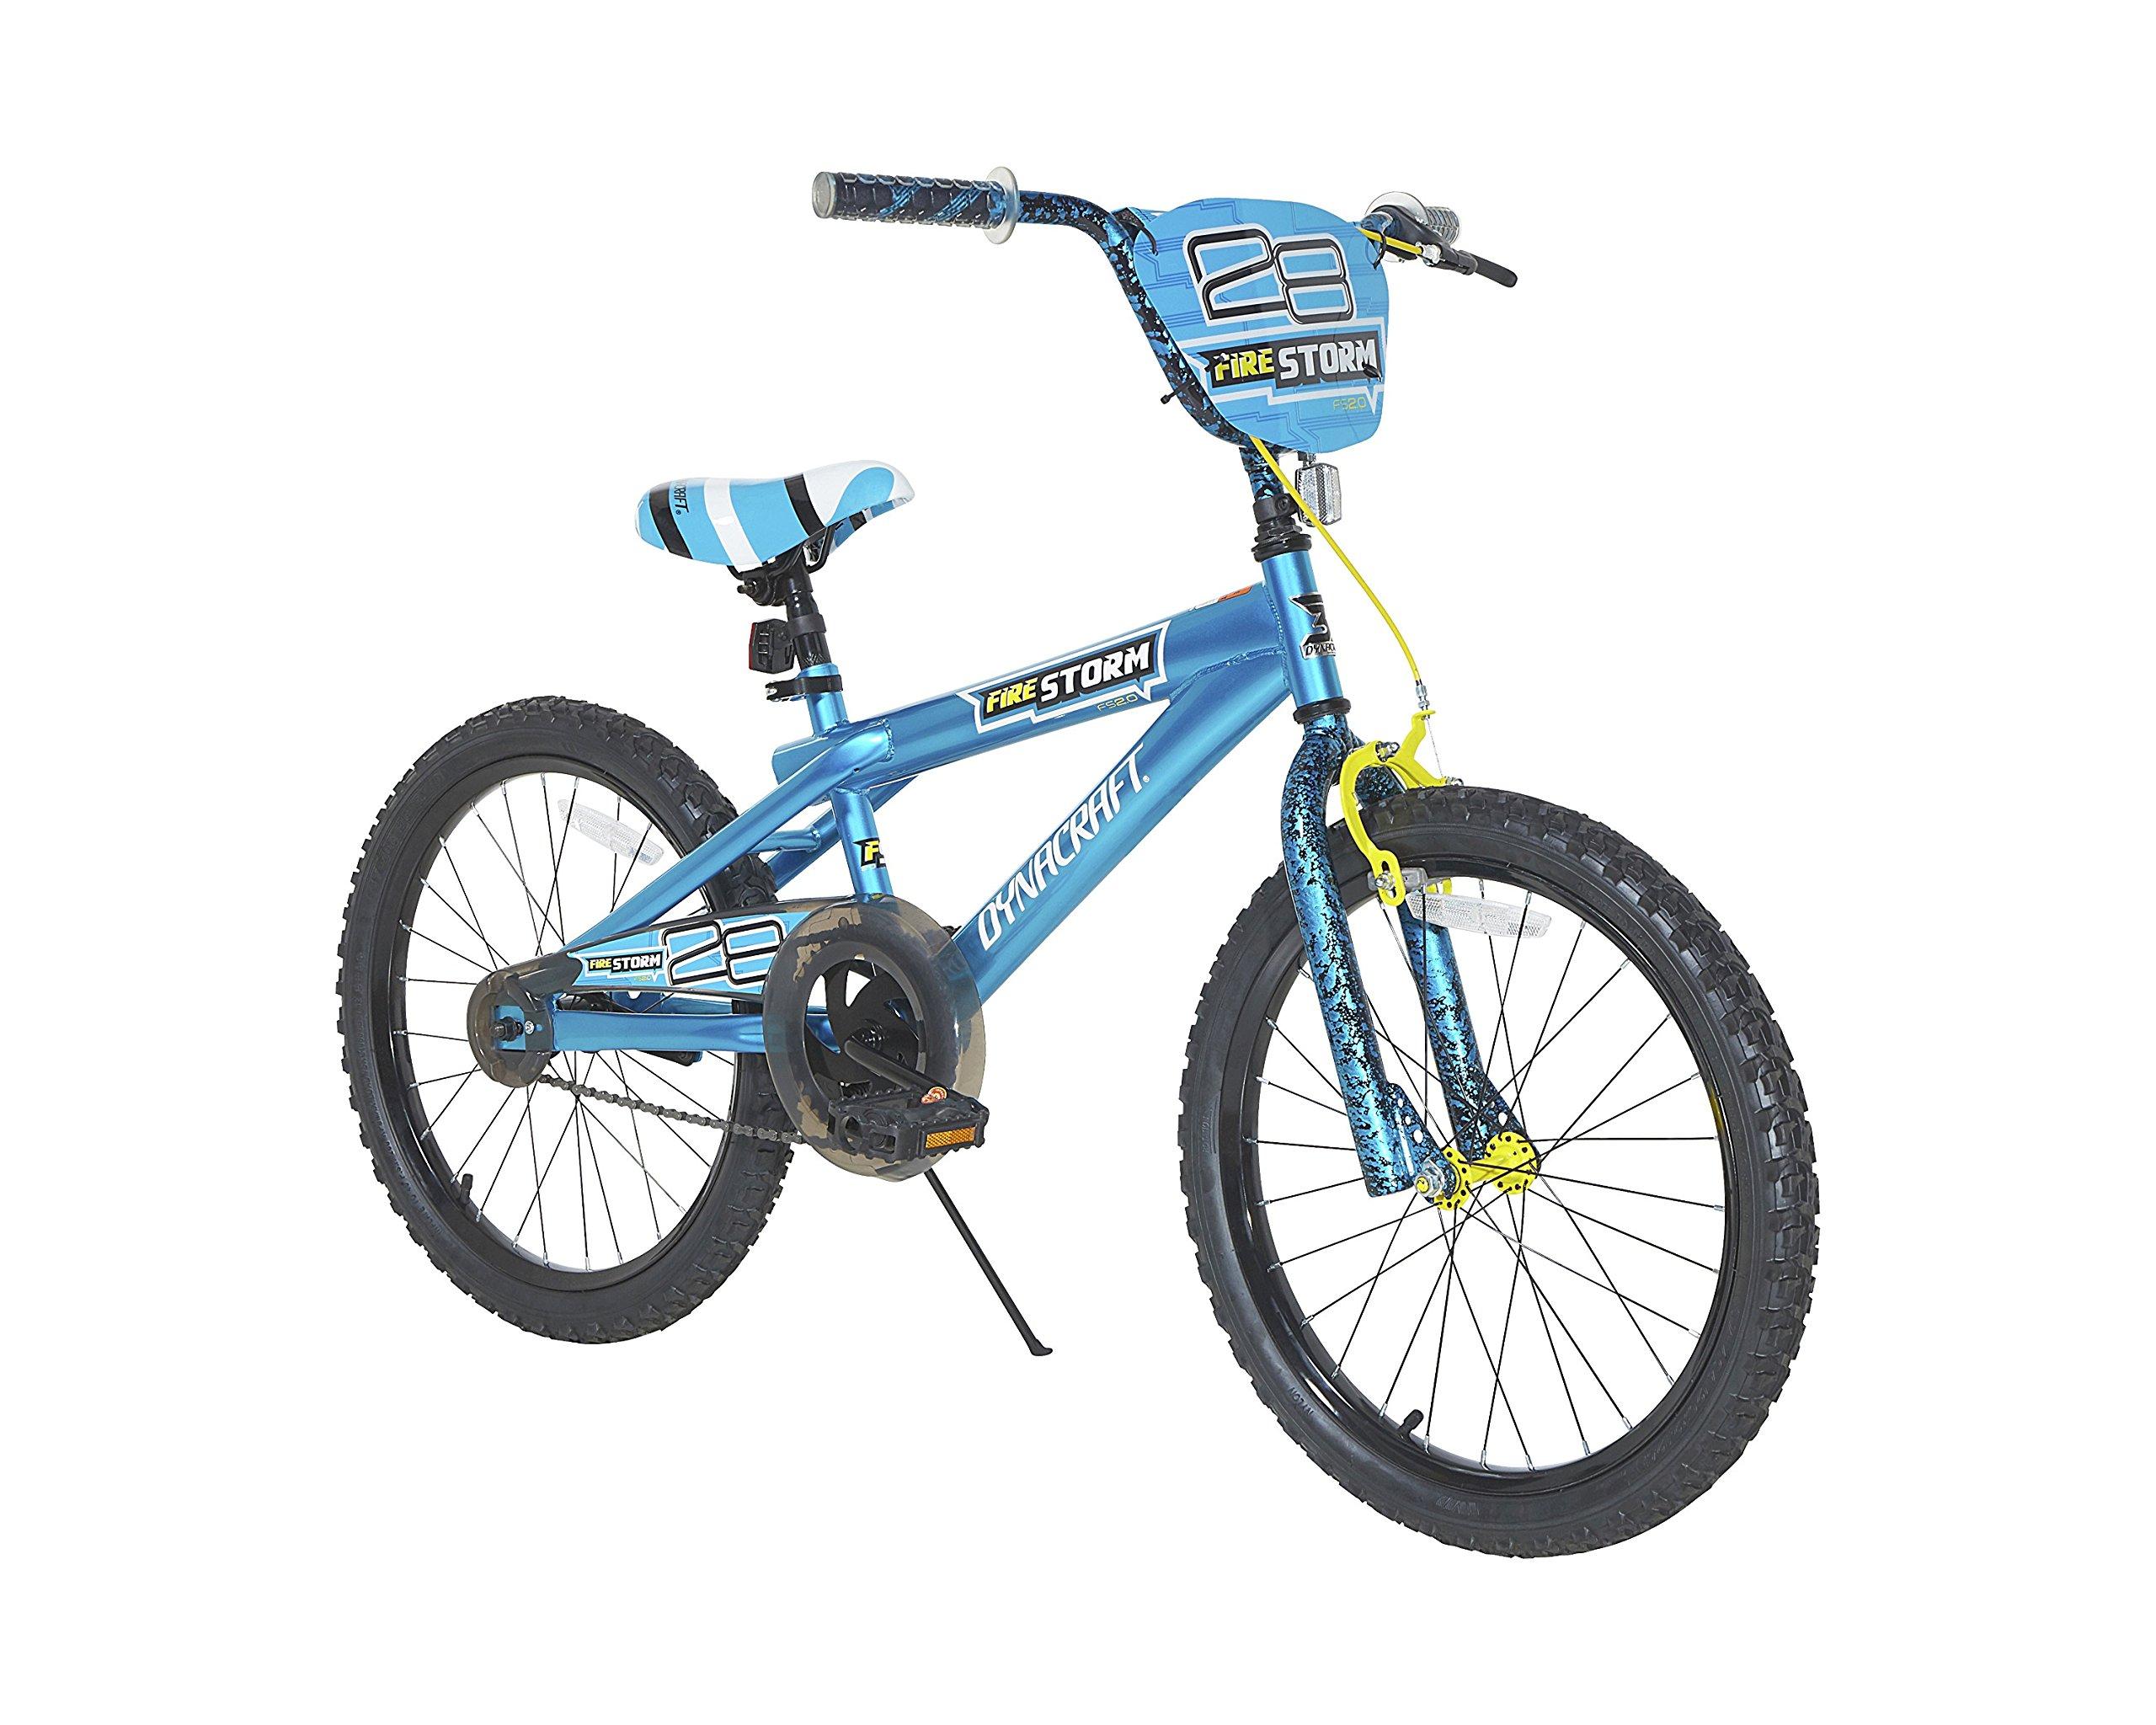 Dynacraft Firestorm Boys BMX Street/Dirt Bike with Hand Brake 20'', Blue/Black/Yellow